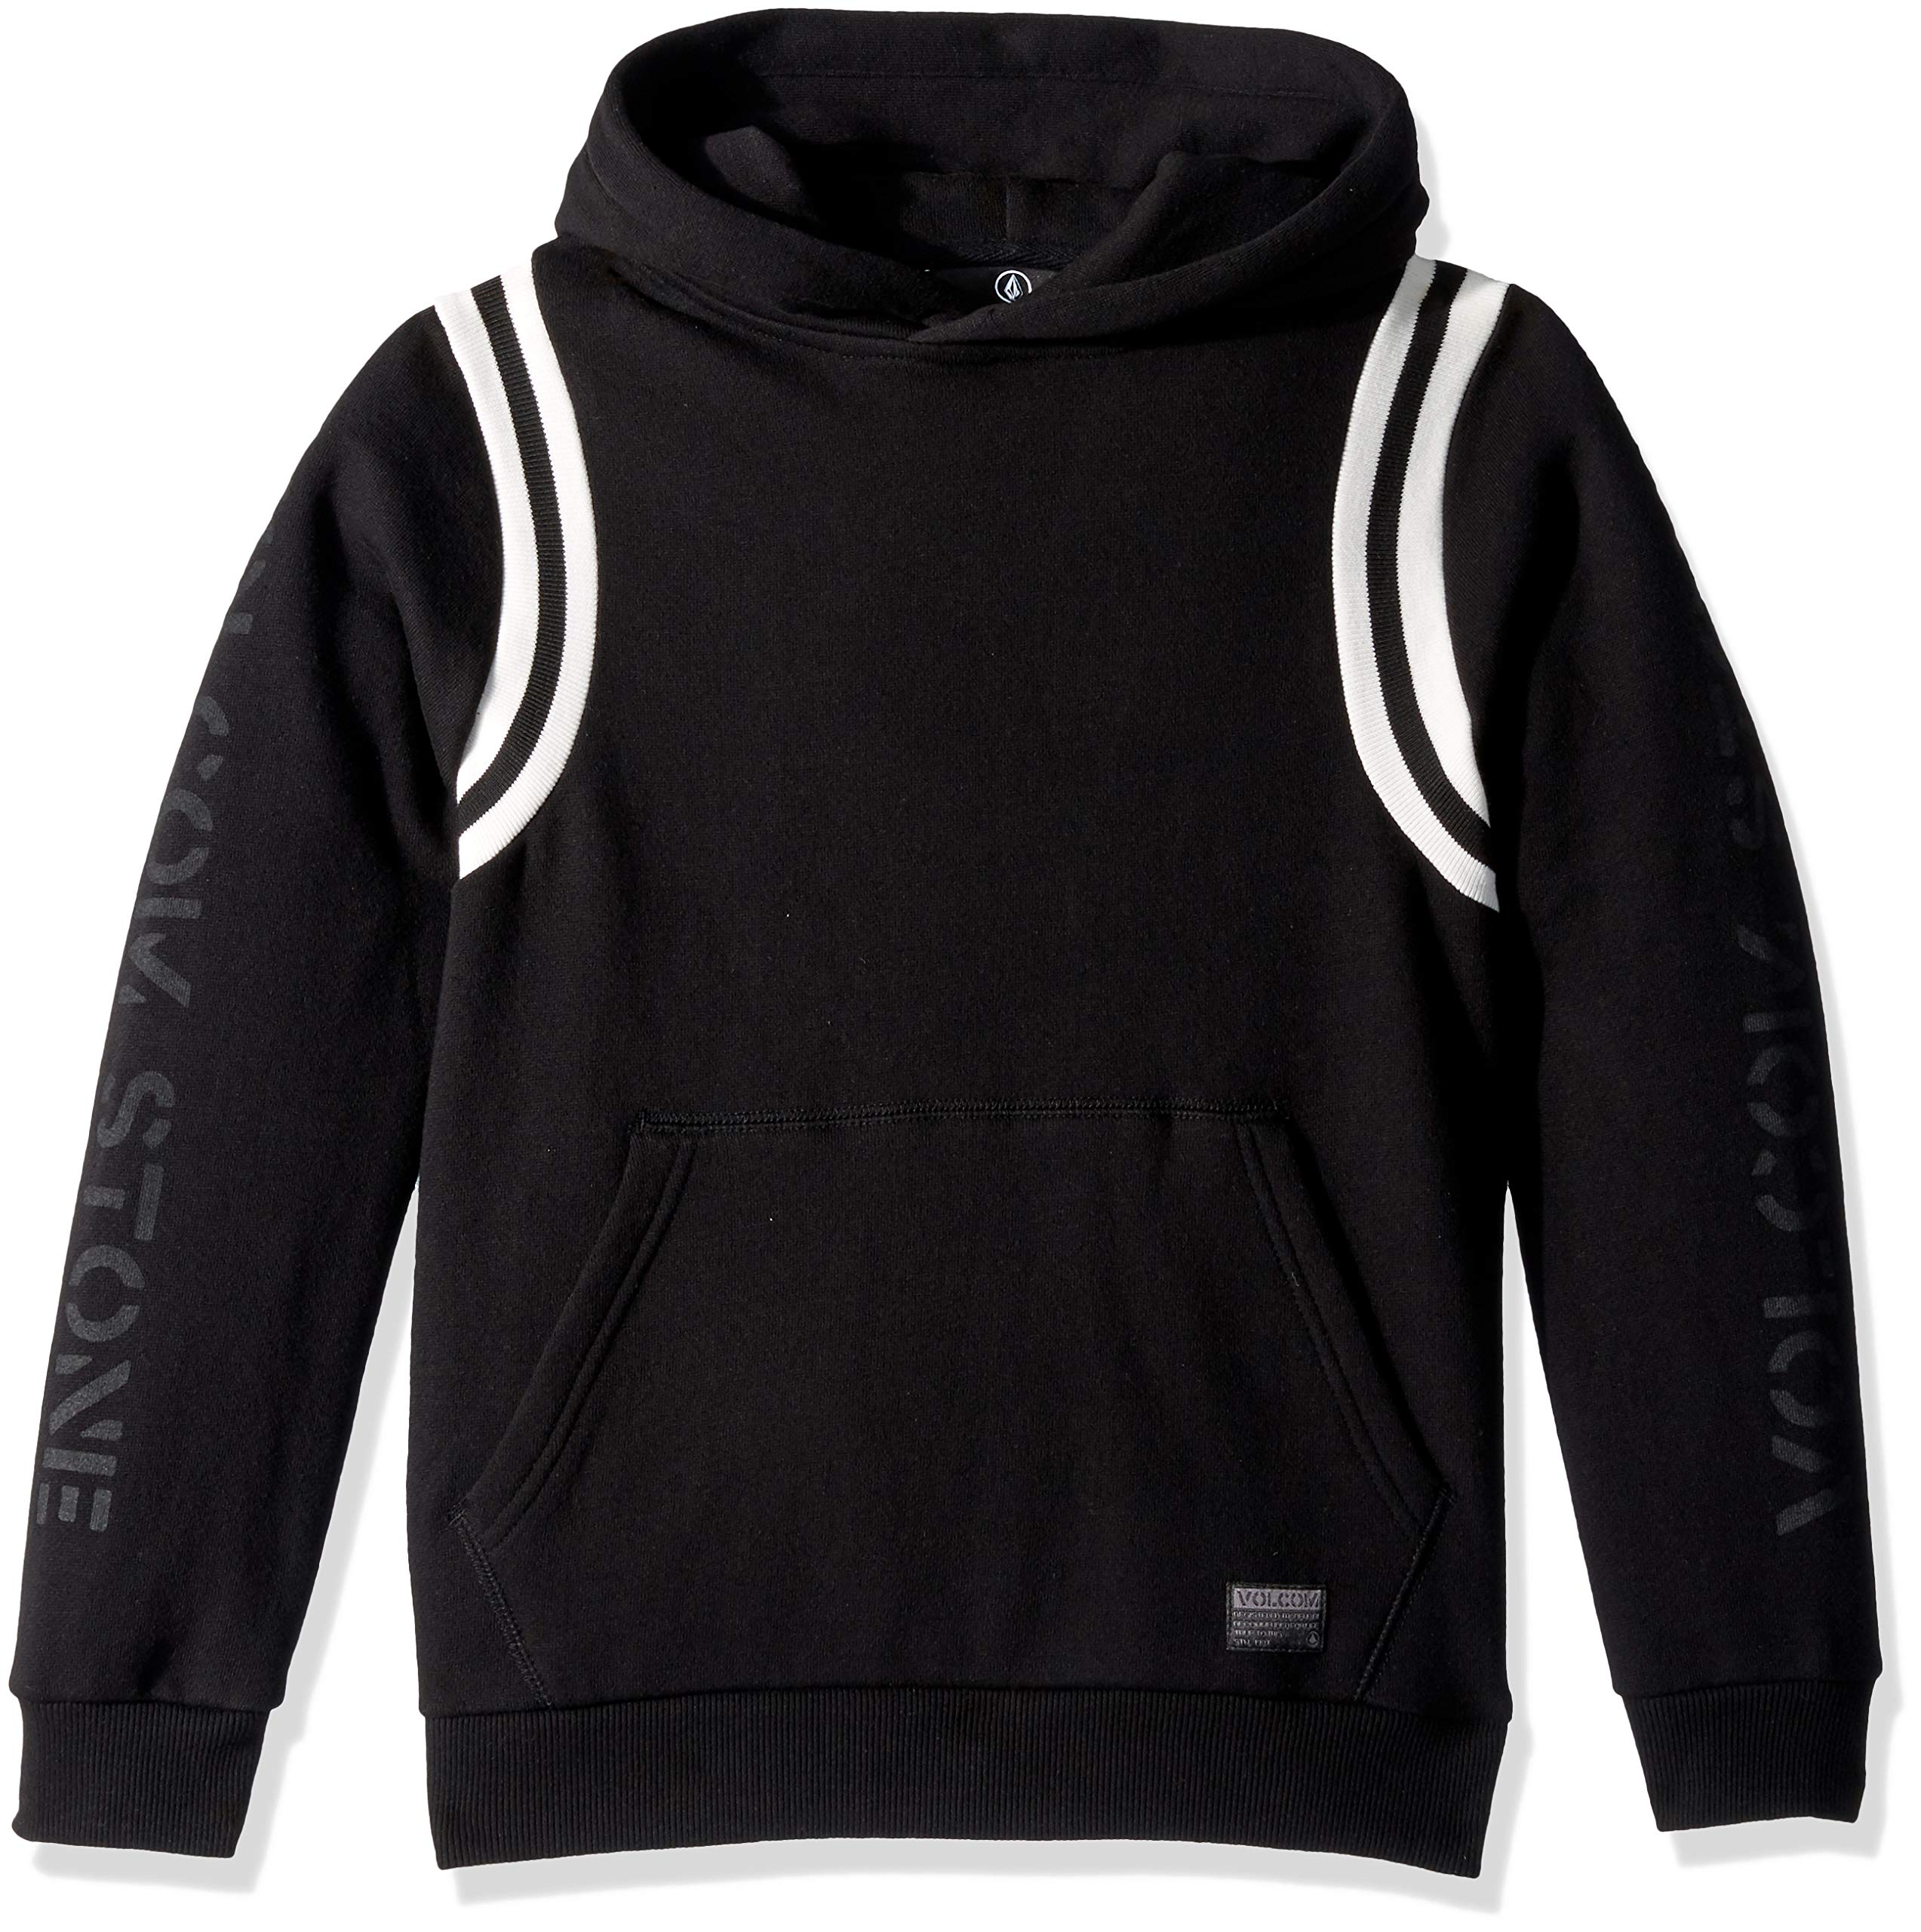 Volcom Big Boys' Thirfter Pullover Hooded Fleece Sweatshirt